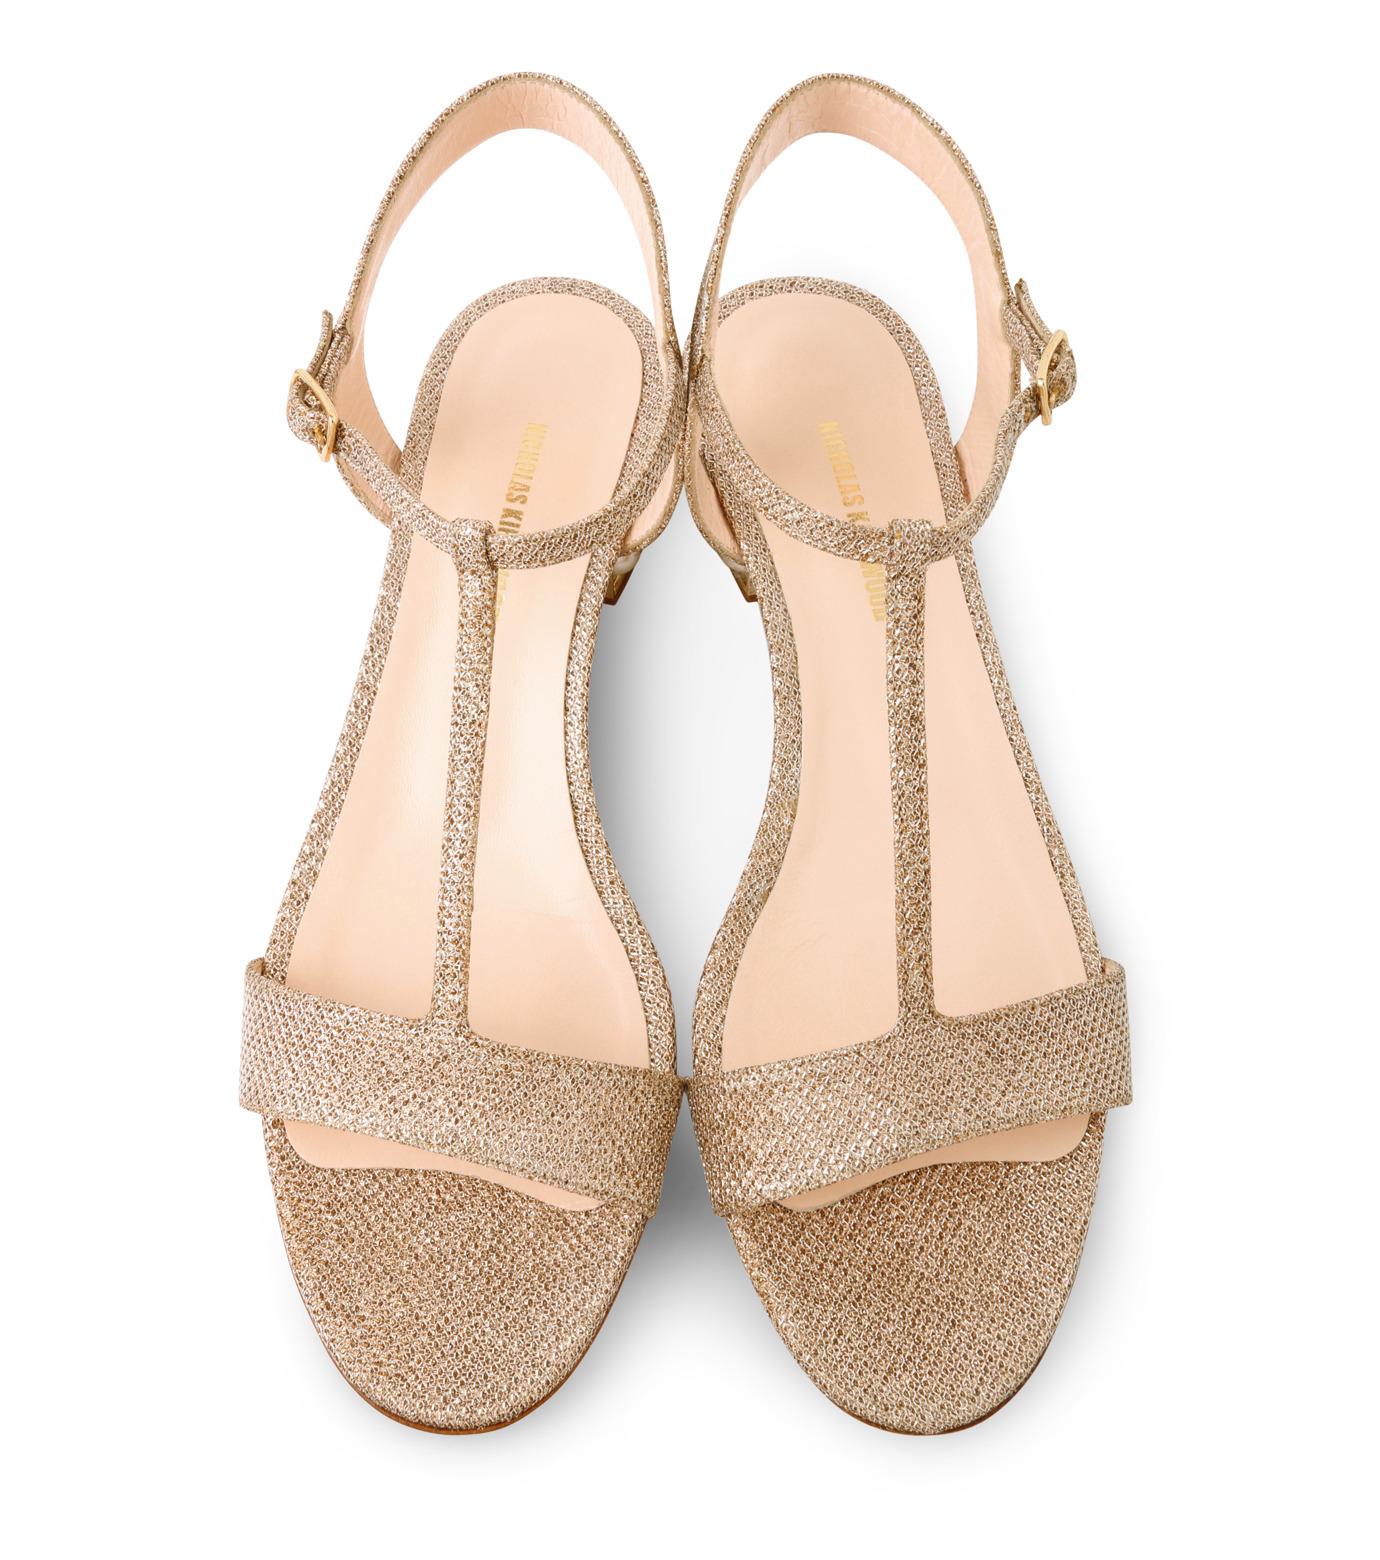 Nicholas  Kirkwood(ニコラス カークウッド)のCasati Pearl Sandal-GOLD(フラットシューズ/Flat shoes)-16S0451-2 拡大詳細画像4